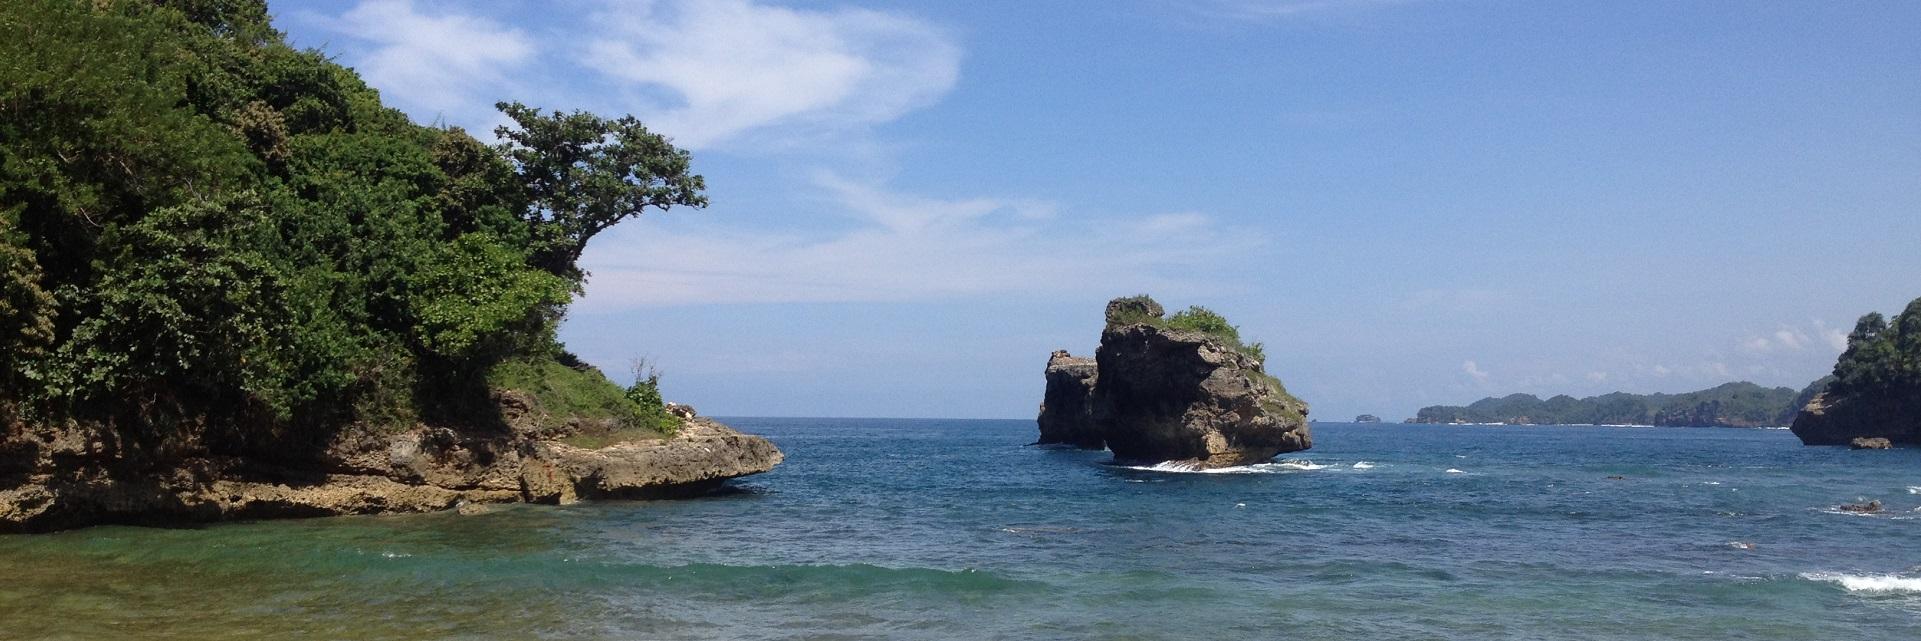 Pantai Ngliyep, Pantai Ngliyep Malang, Malang, Kabupaten Malang, Dolan Dolen, Dolaners Pantai Ngliyep via Bagus Abdurrahman Wahid - Dolan Dolen